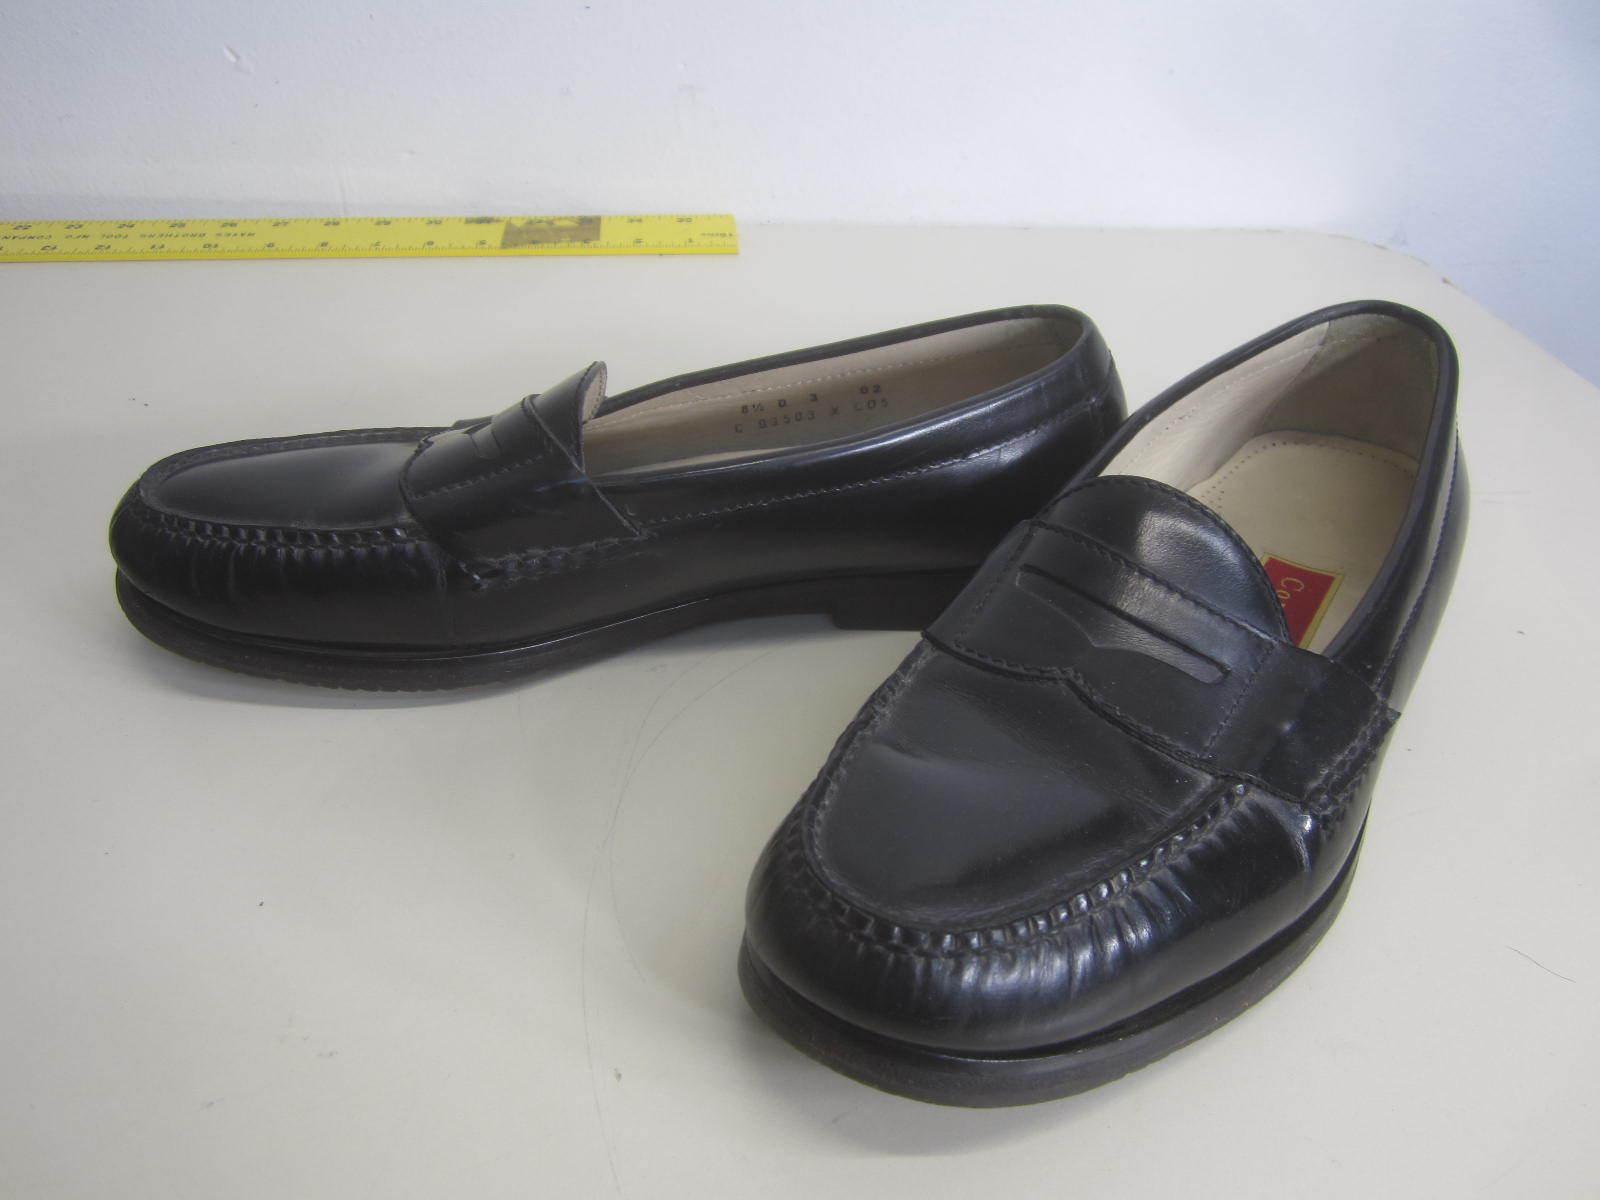 Vtg Cole Haan Penny Loafers Slip On Dress shoes black leather sz 8.5 D